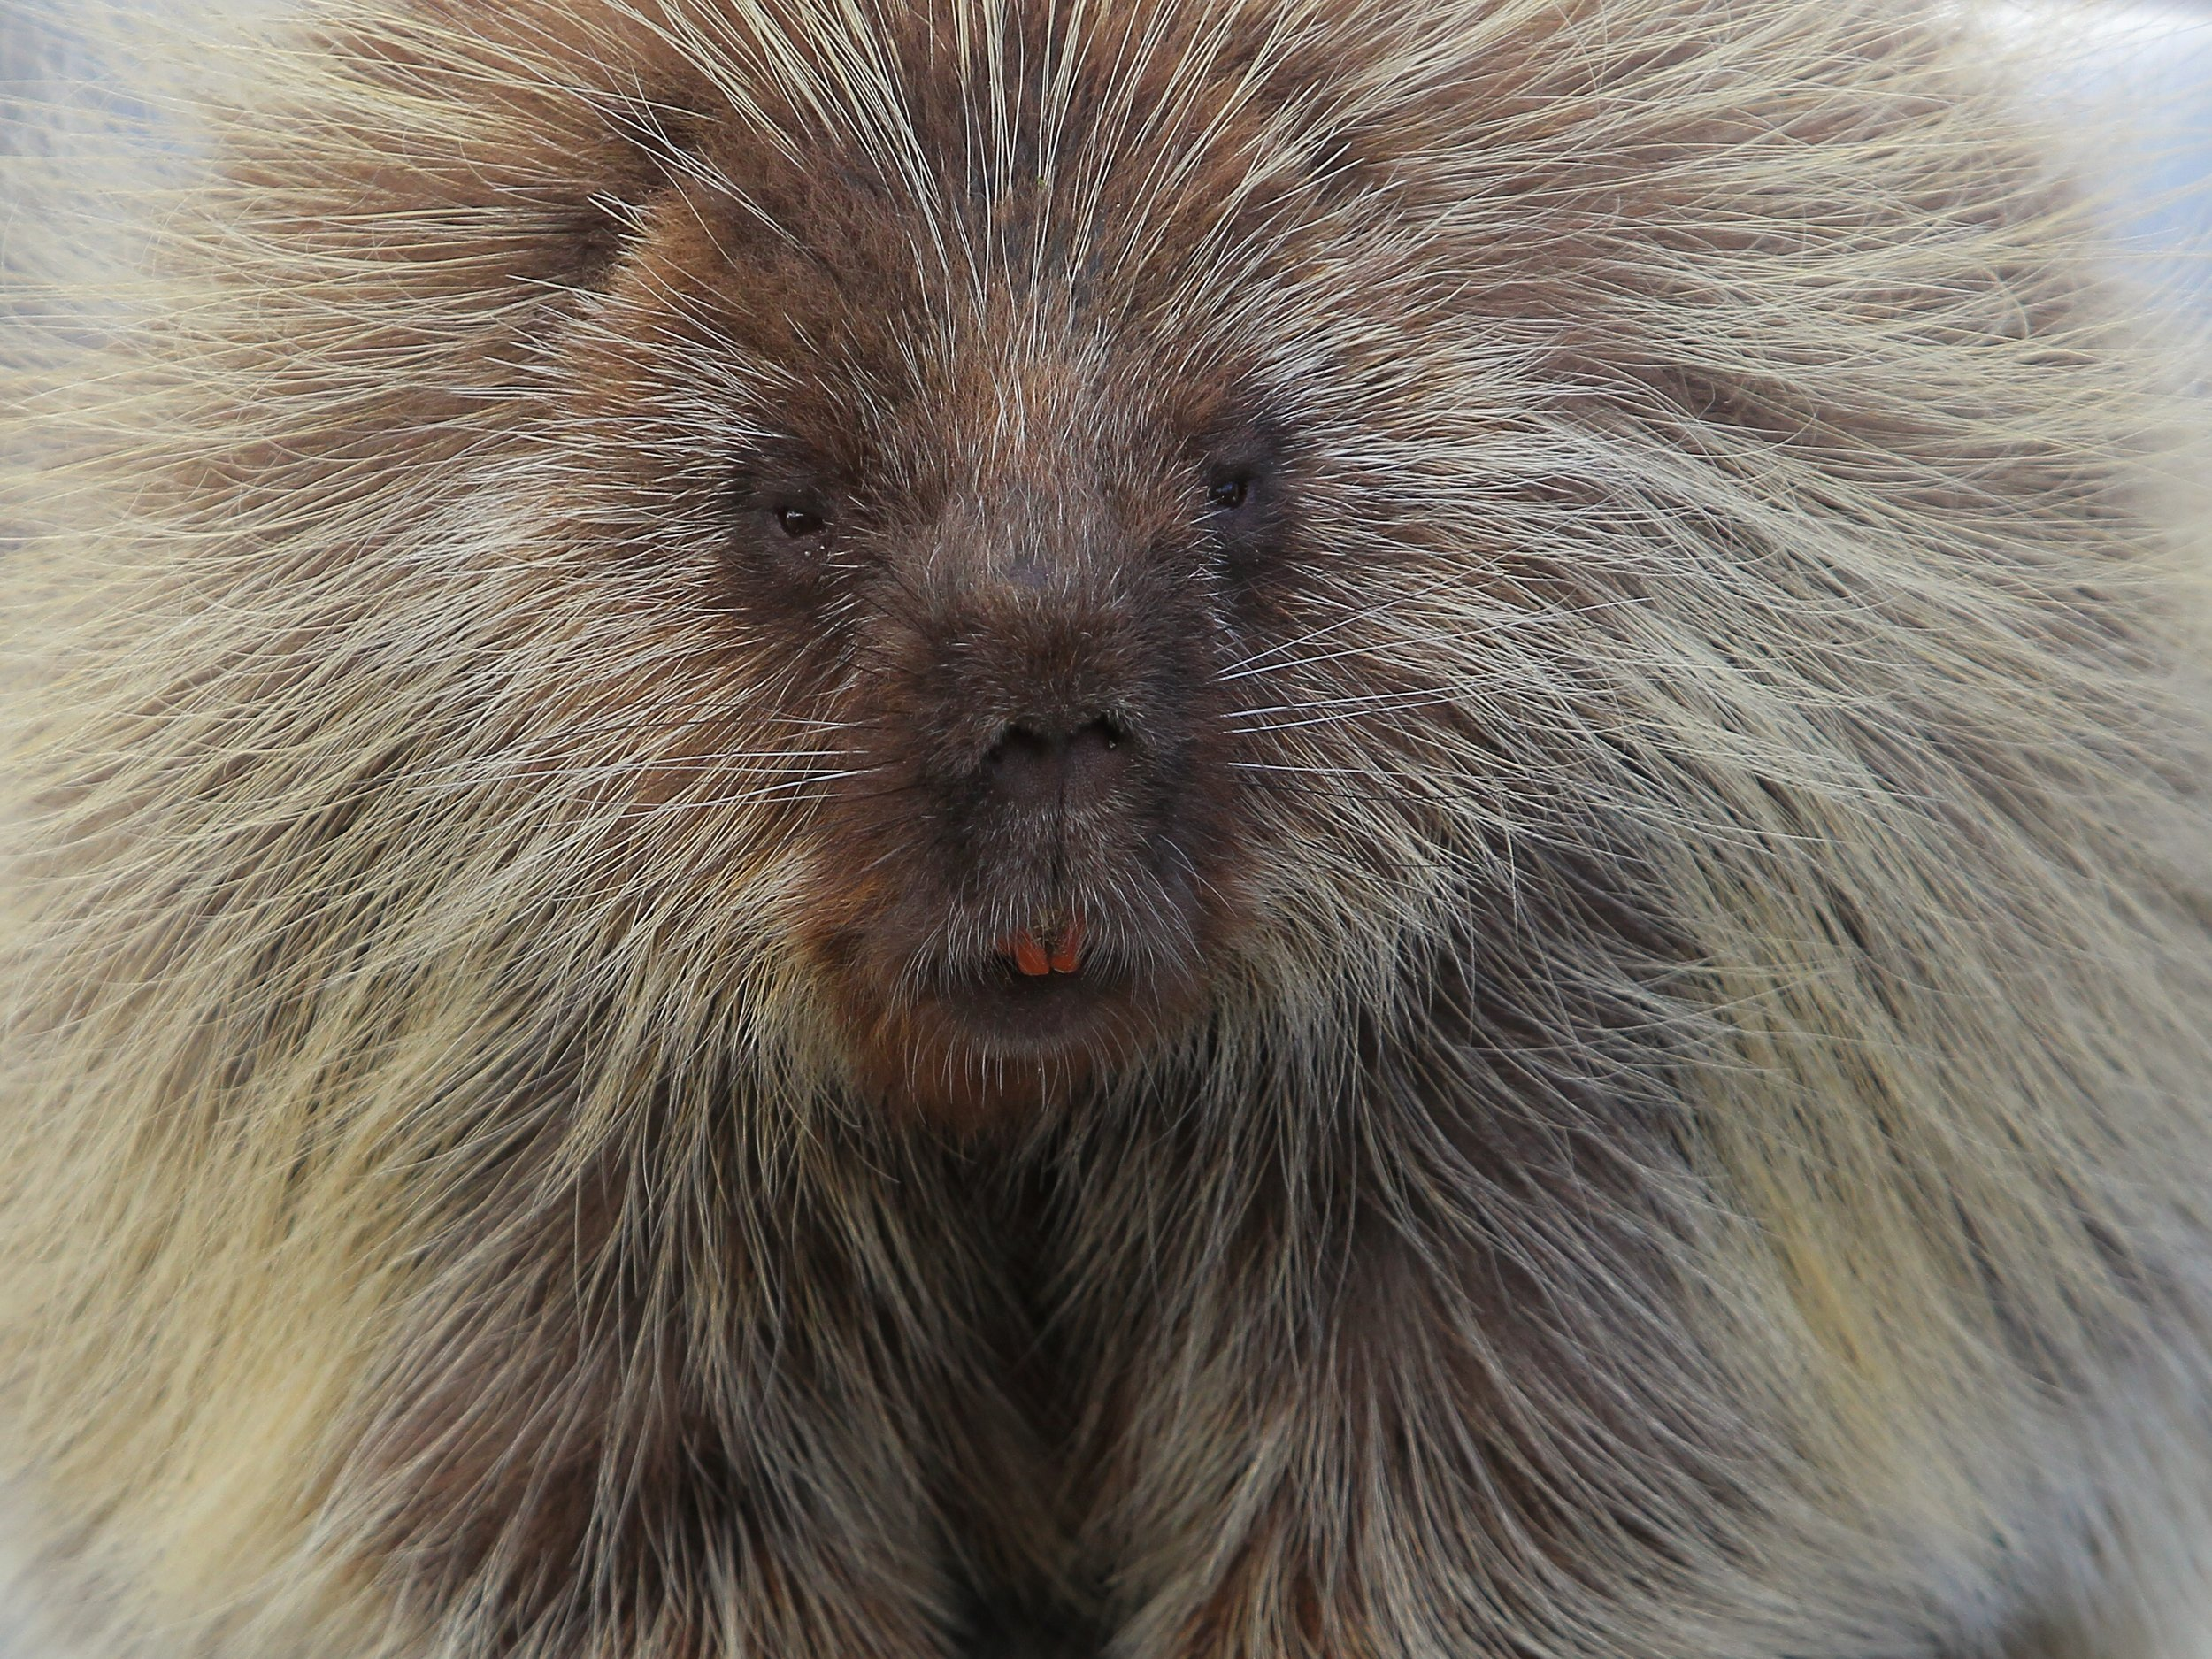 Adult Porcupine